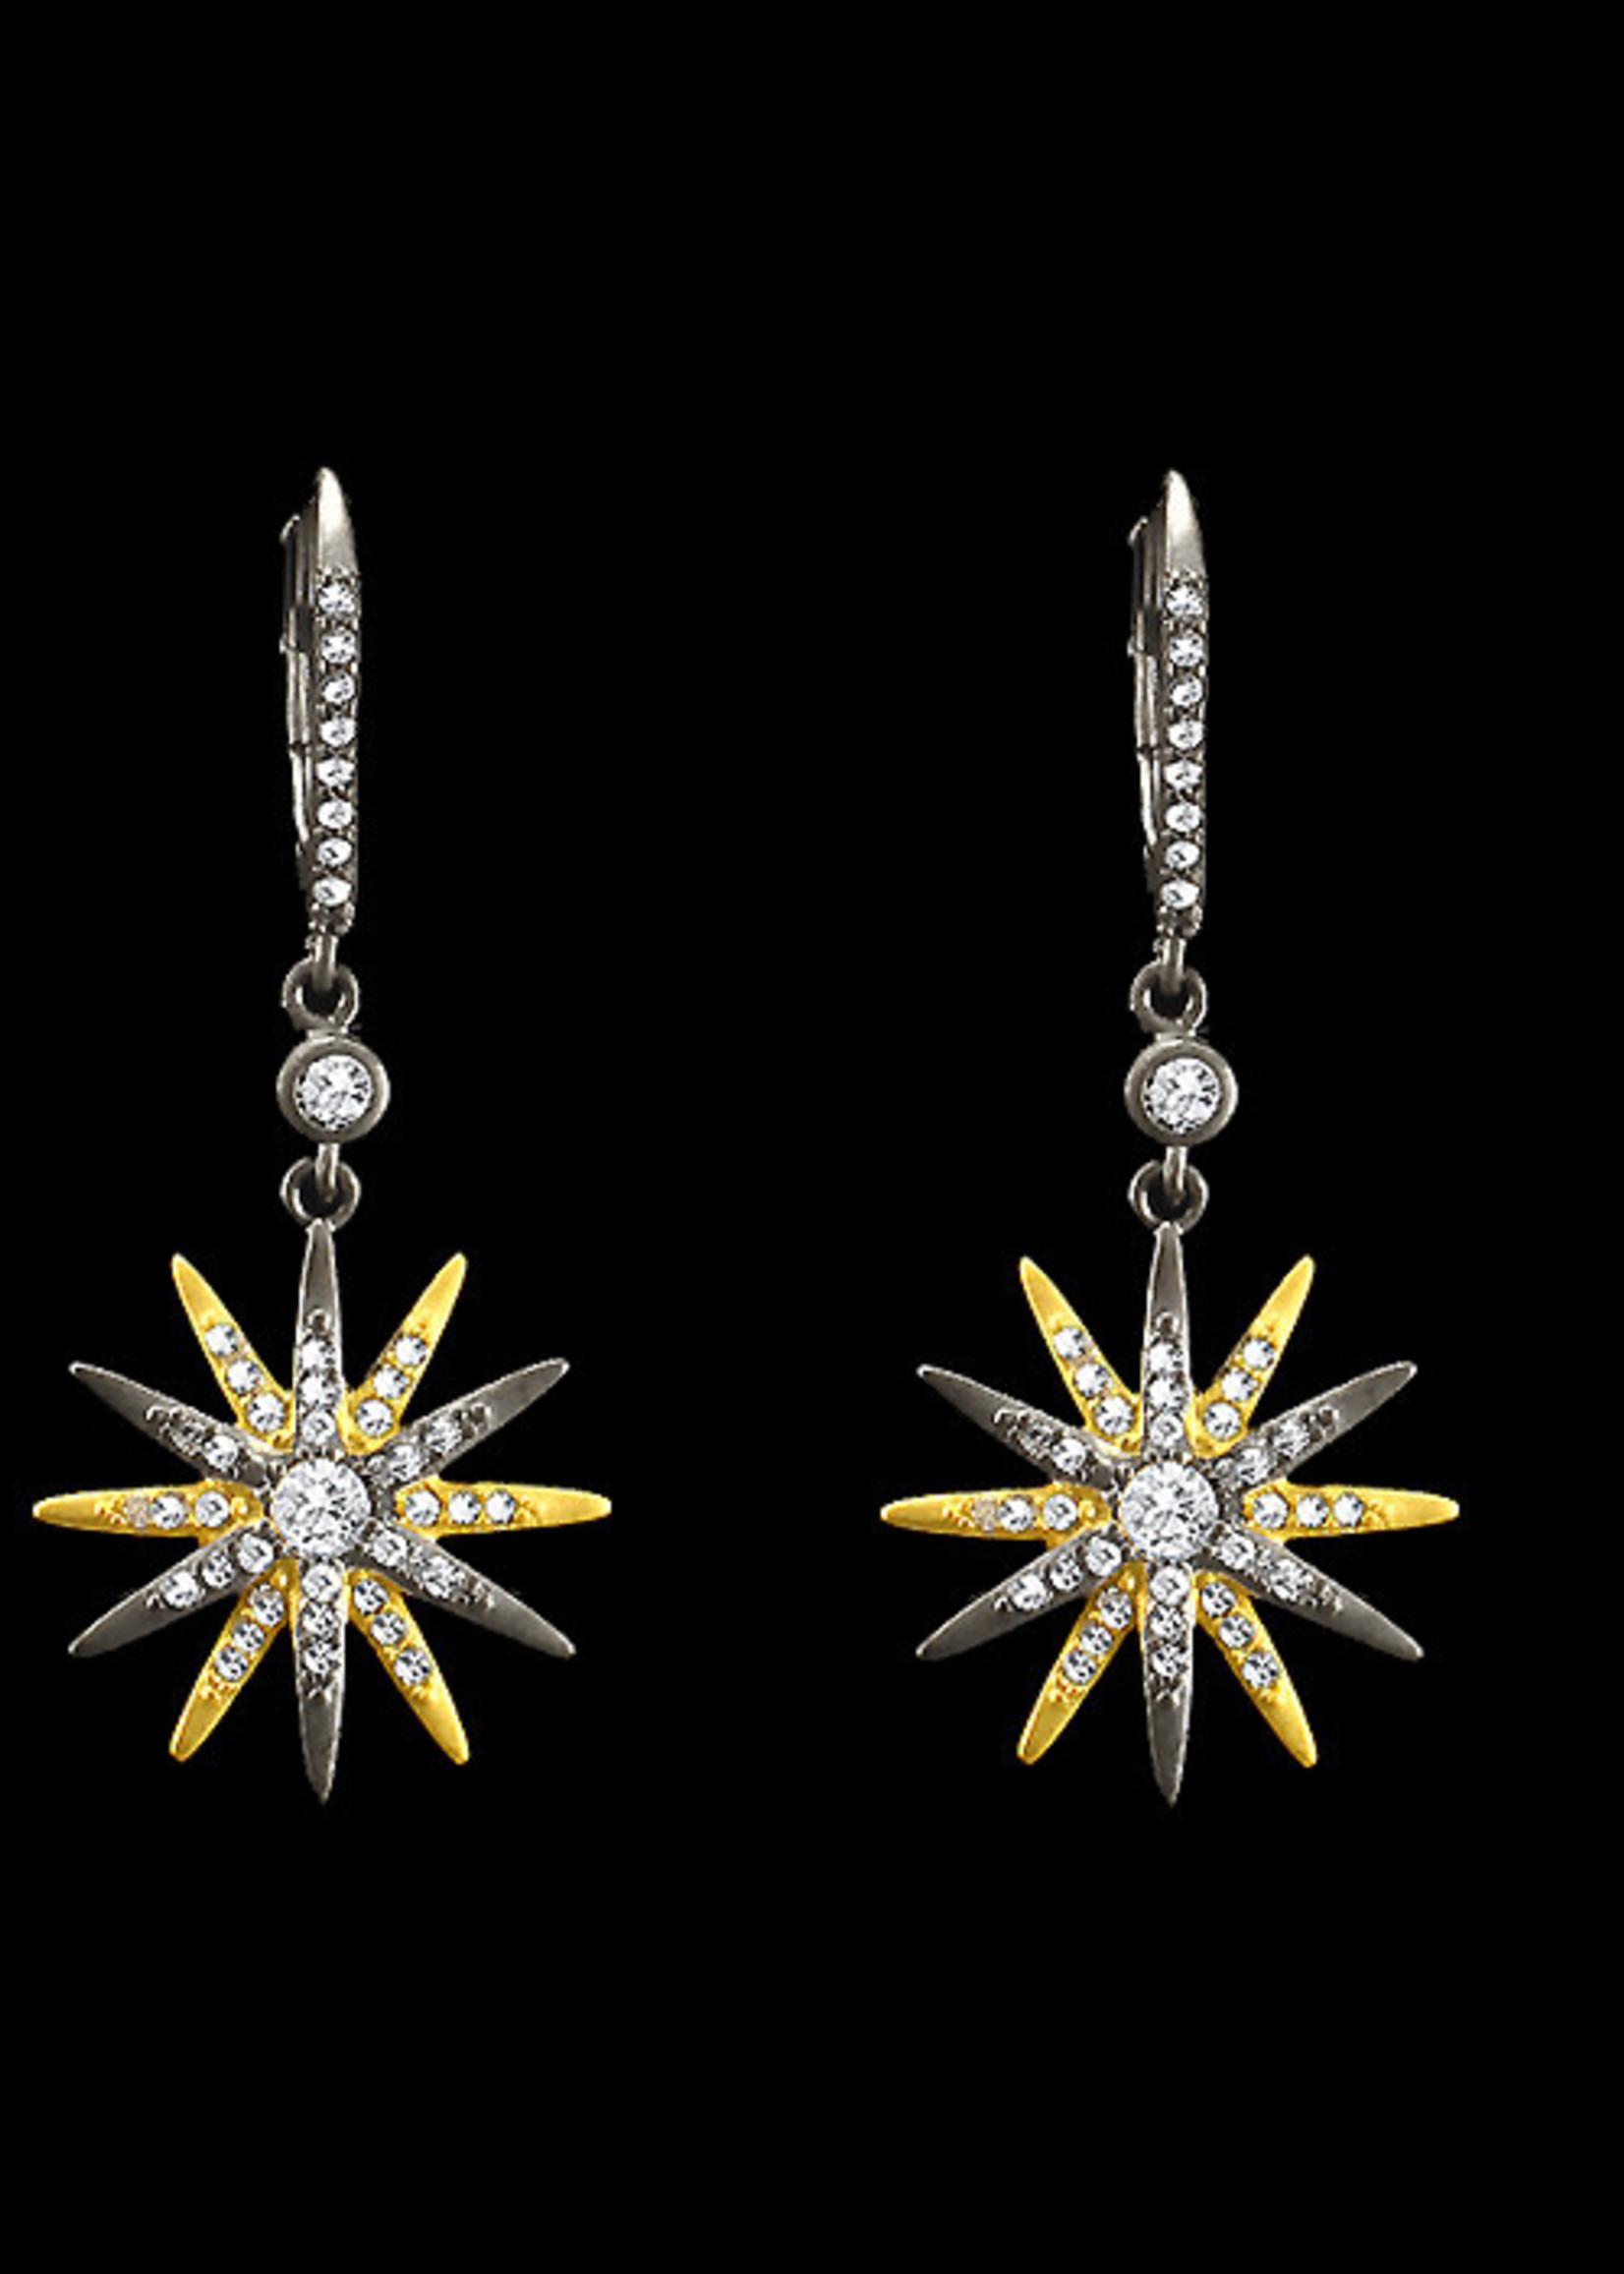 Be-Je Designs Beje - 2Tone Starburst Earring (PU6251E)